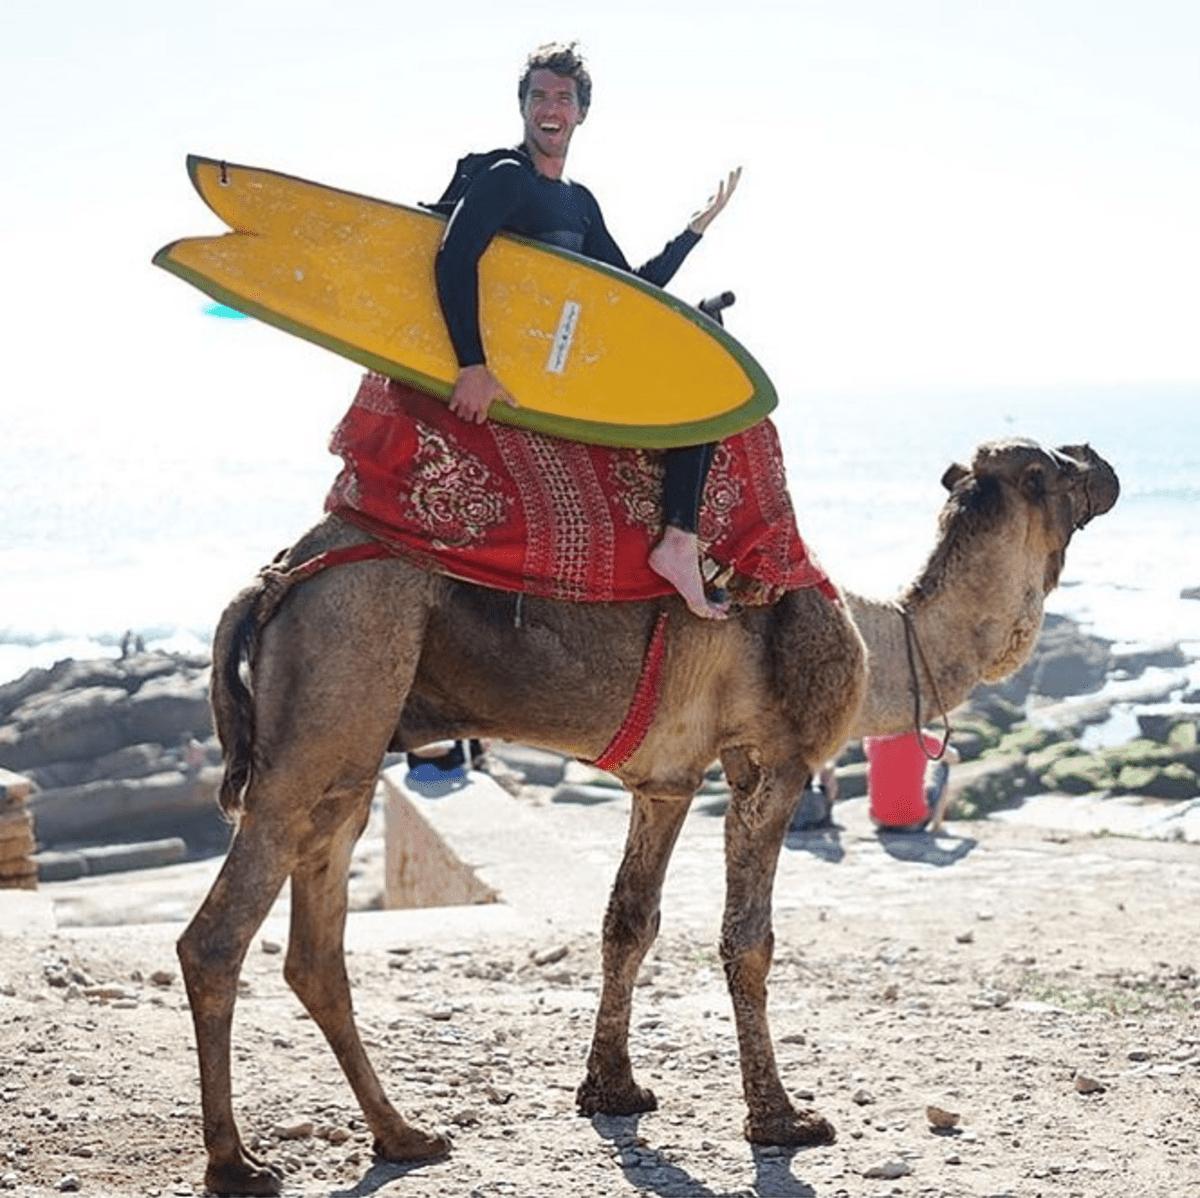 surfboard yellow camel ryan lovelace